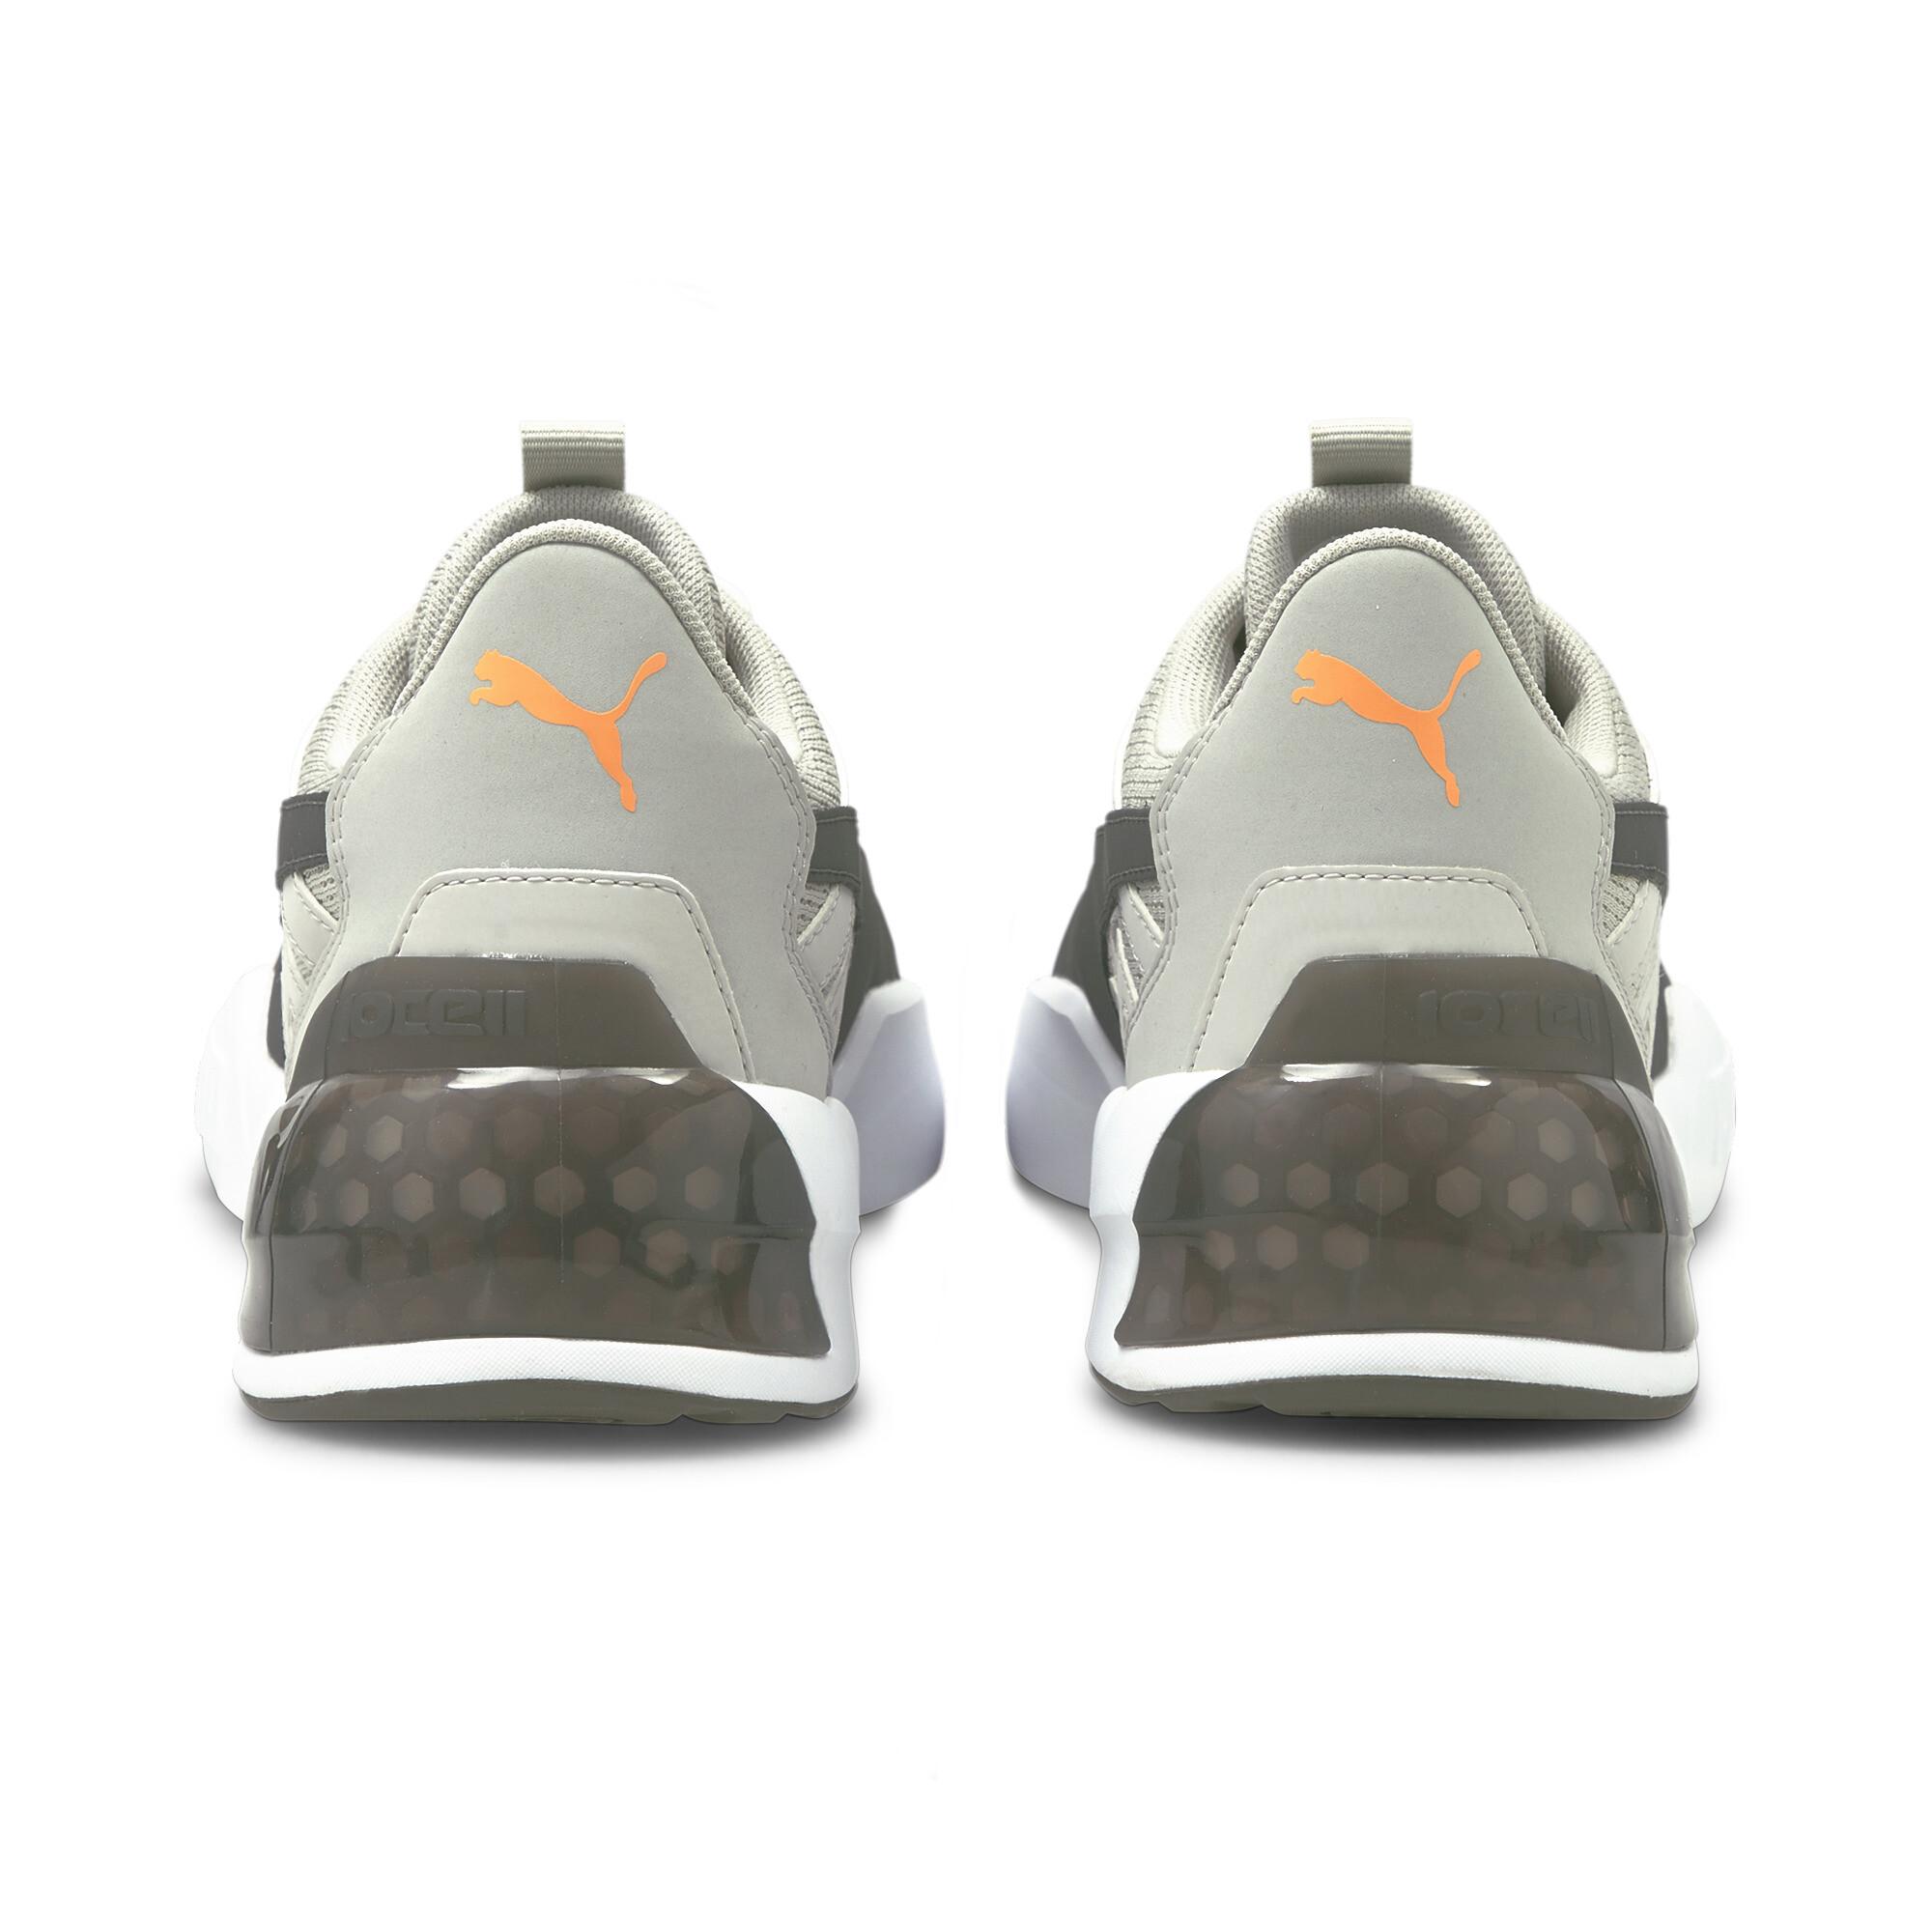 thumbnail 47 - PUMA Men's CELL Pharos Training Shoes